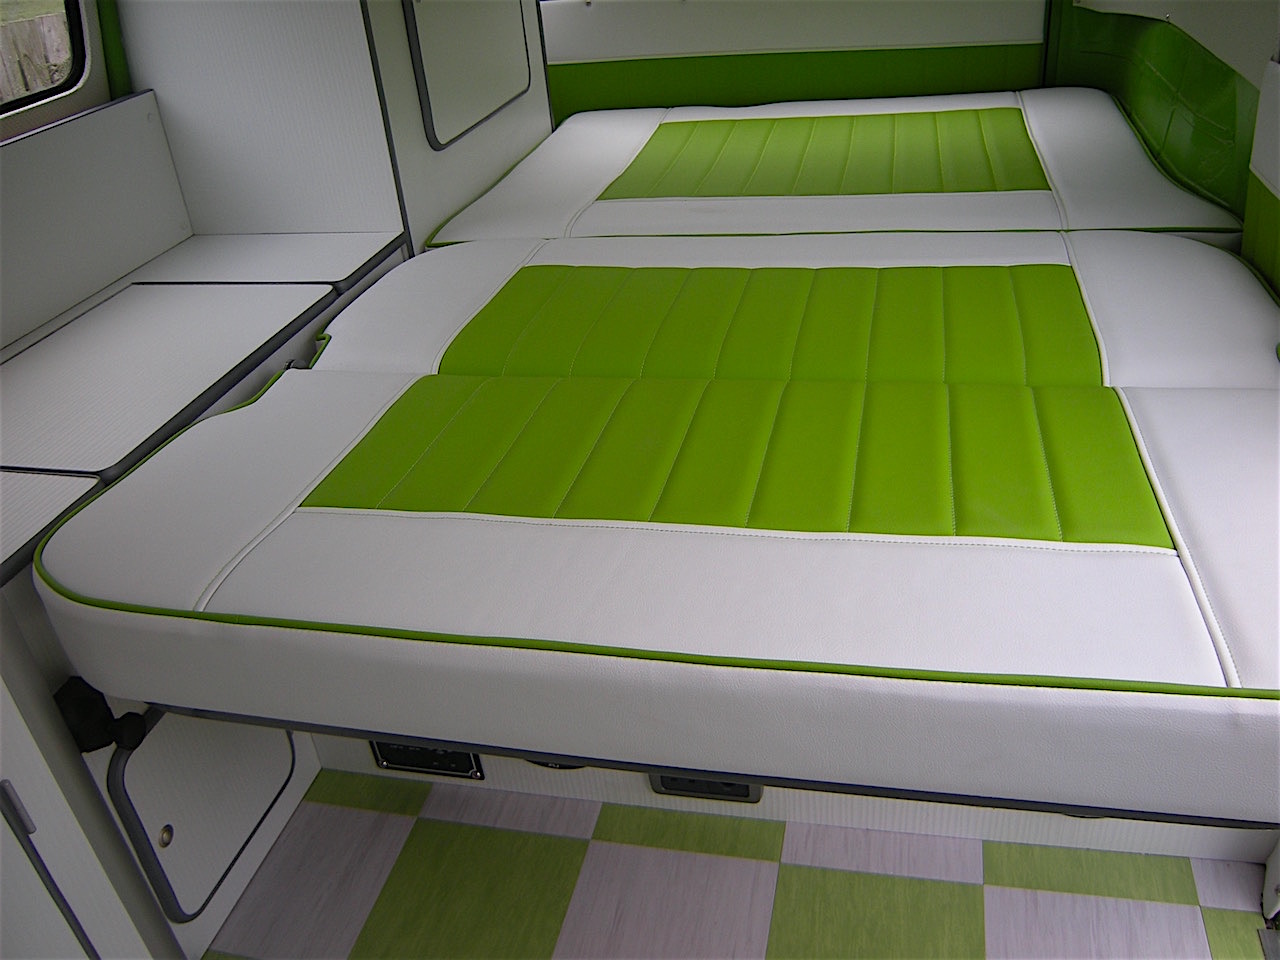 Split Screen Interior Vw Camper Interiors